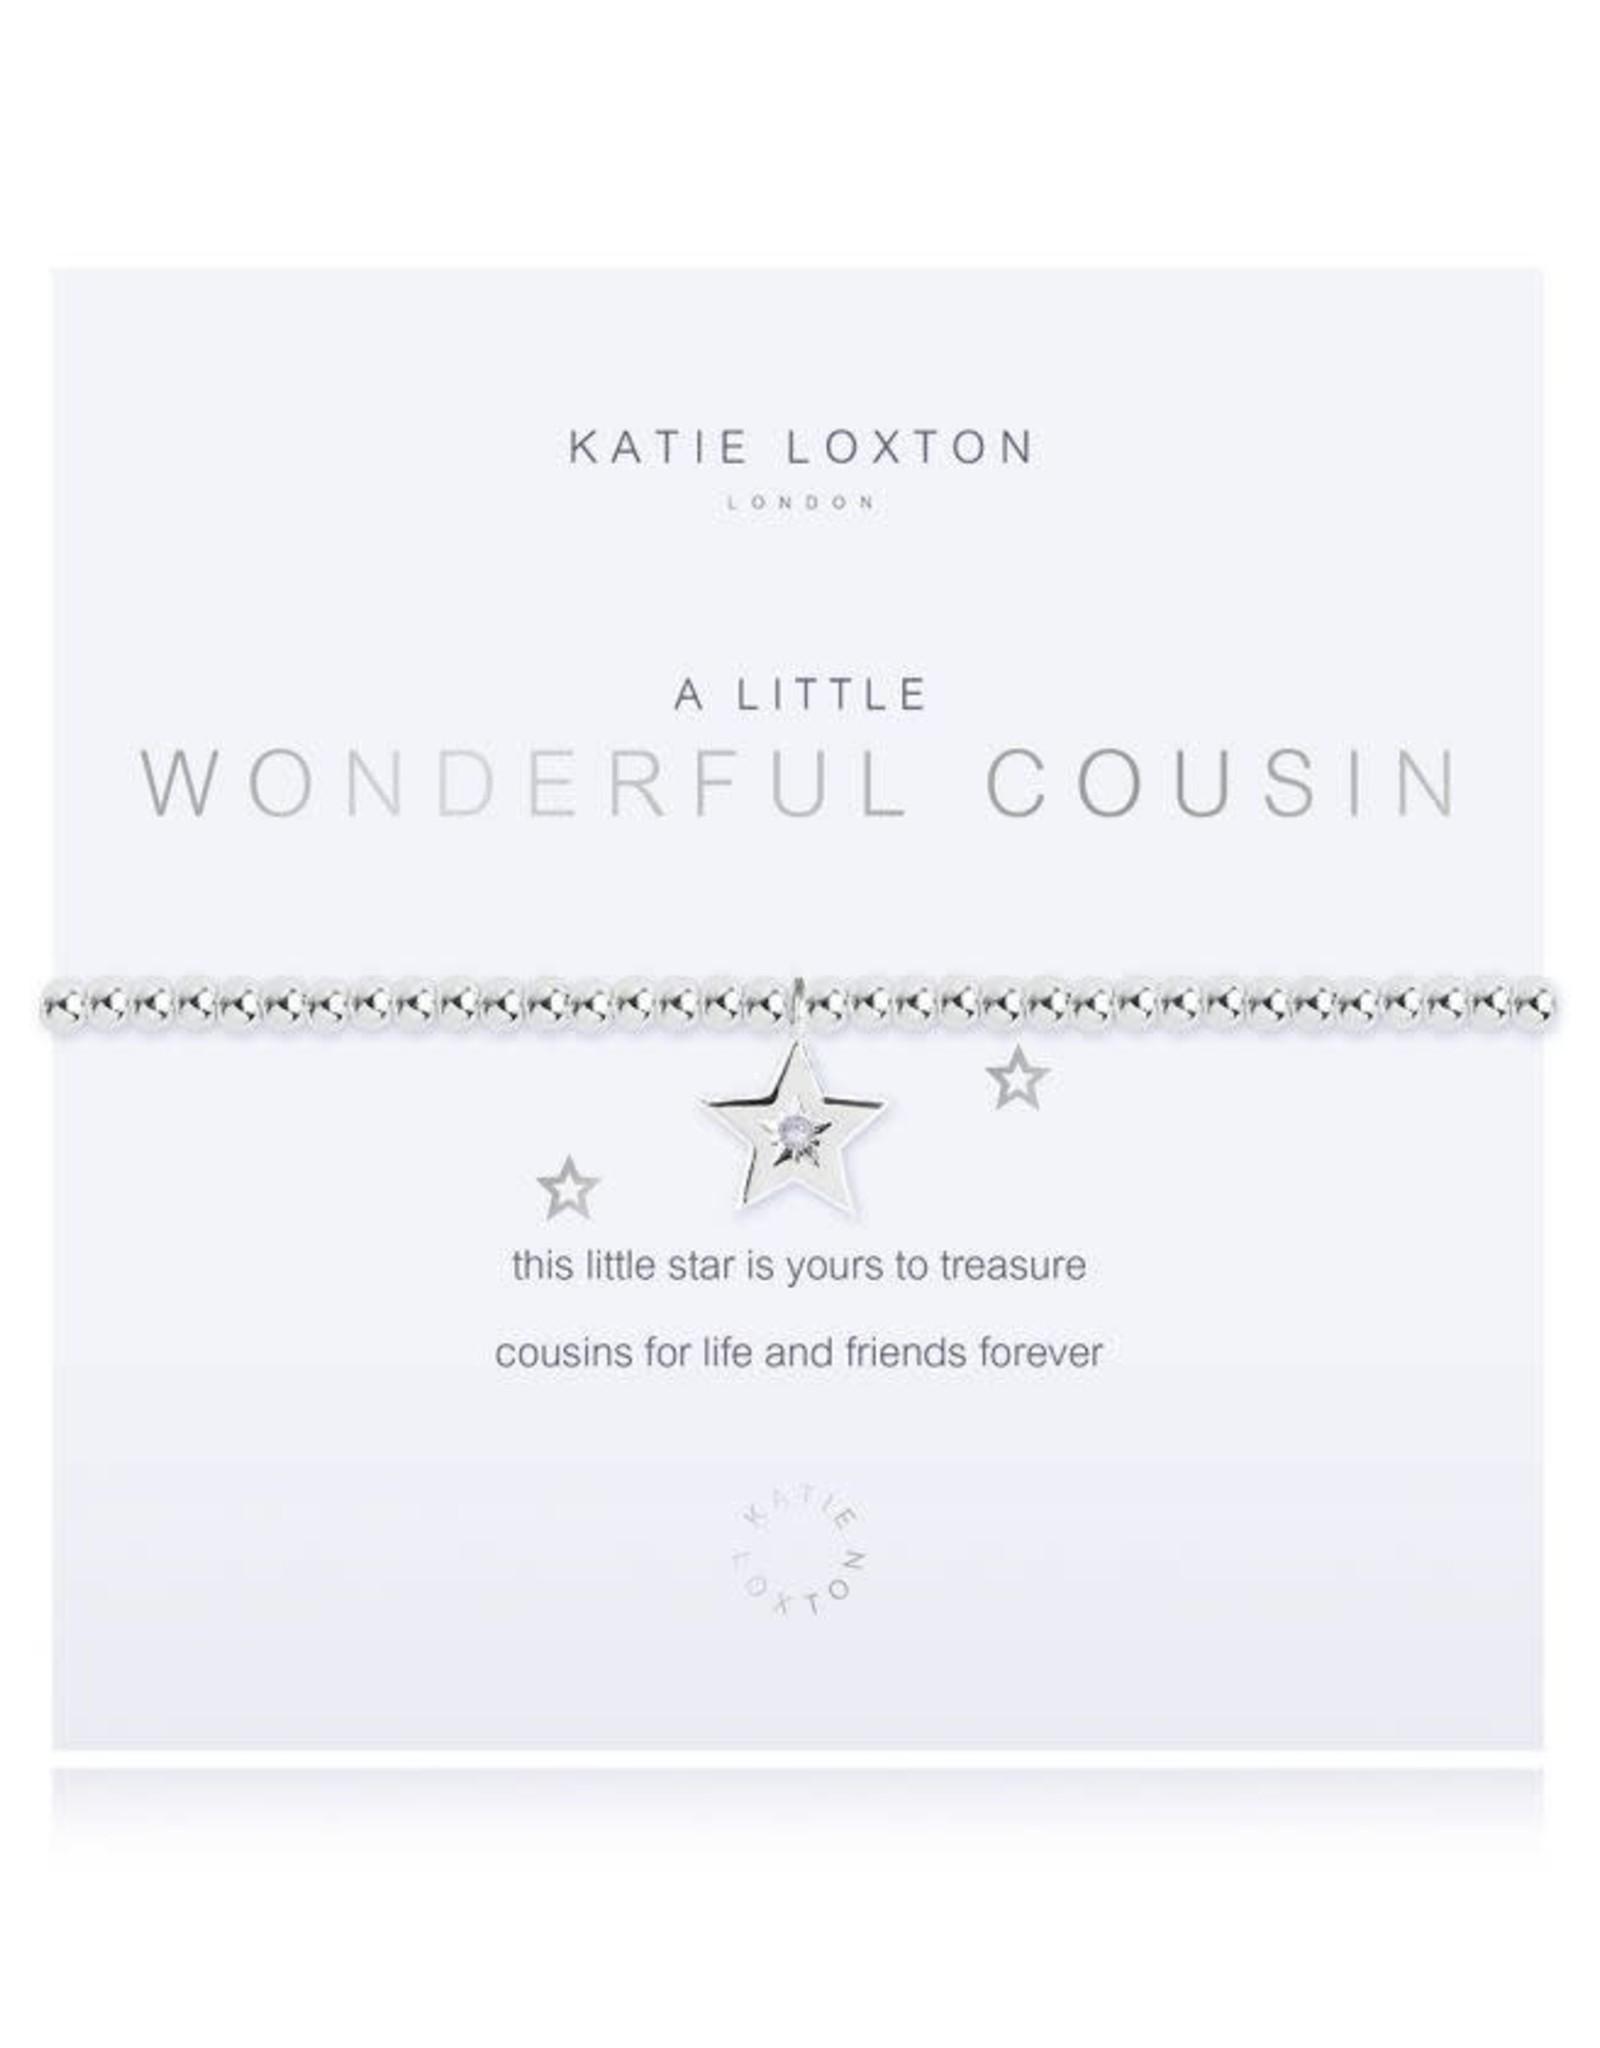 Katie Loxton Bracelet-Wonderful Cousin